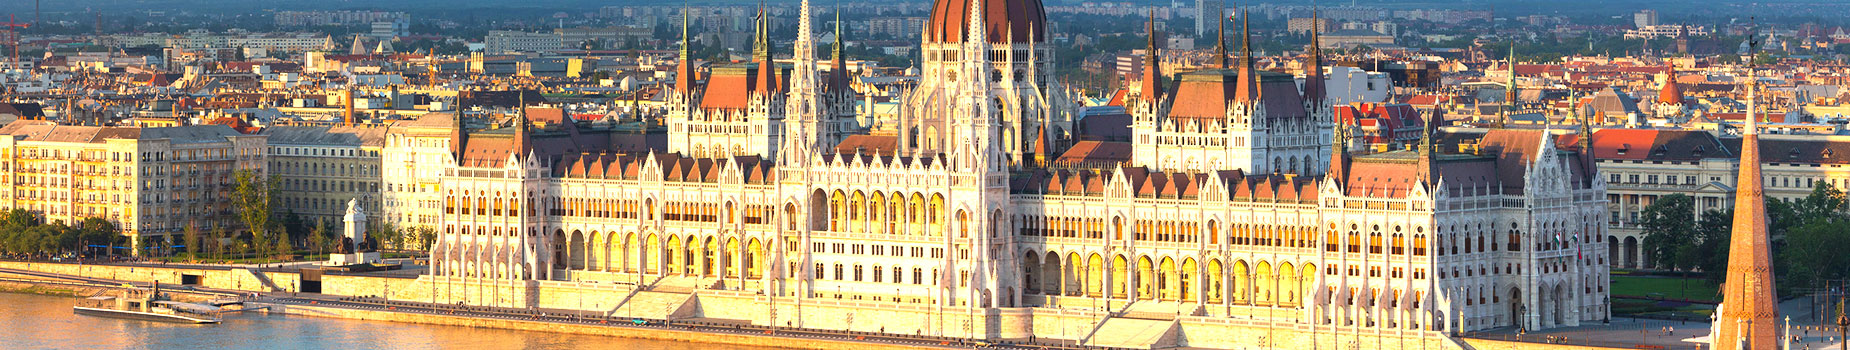 Vlieg busreis Hongarije